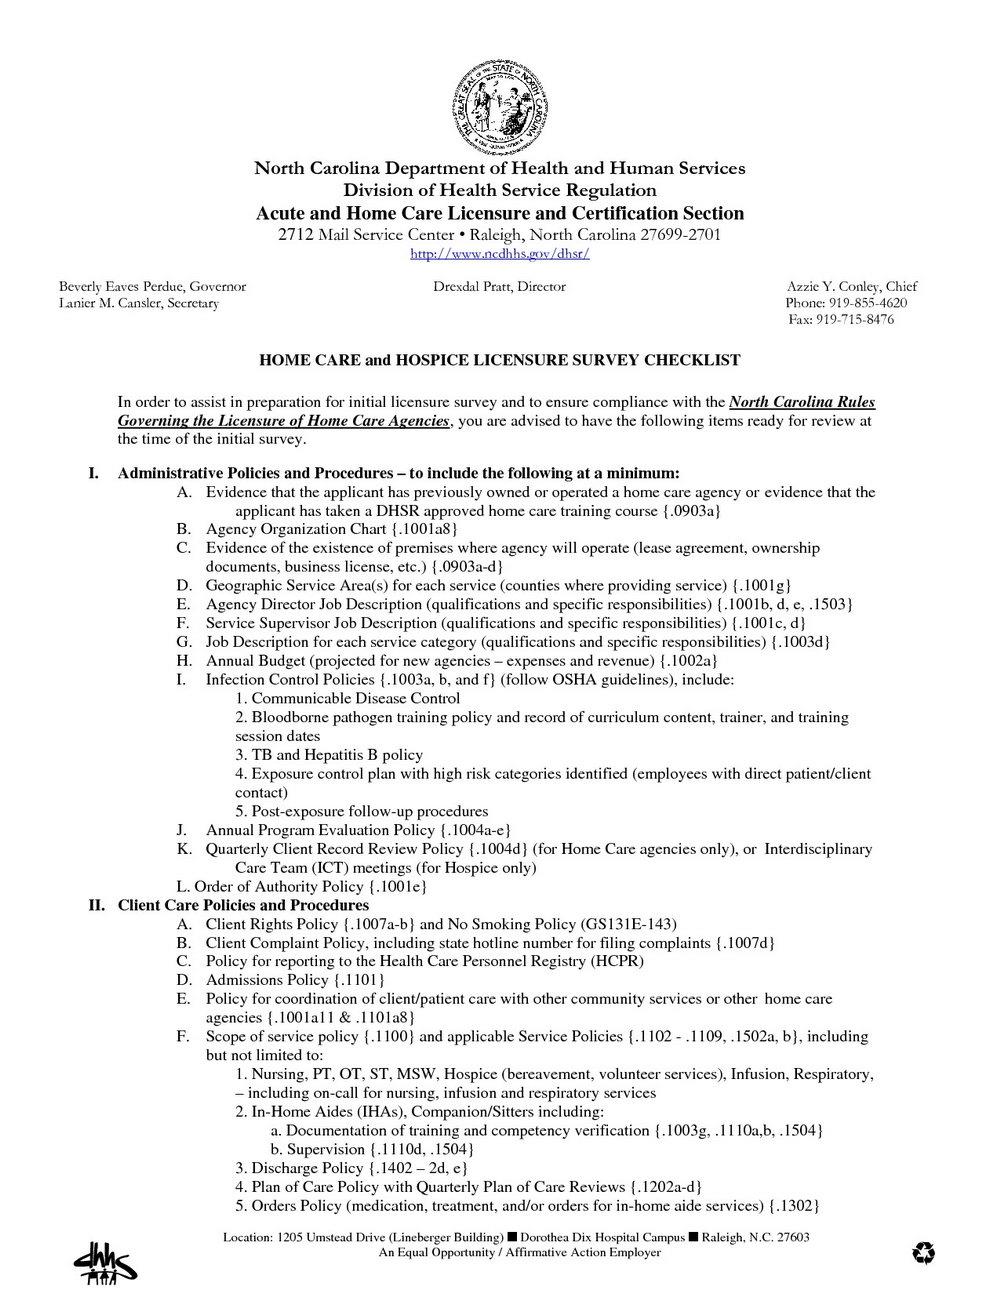 Best Resume Writing Service For Nurses